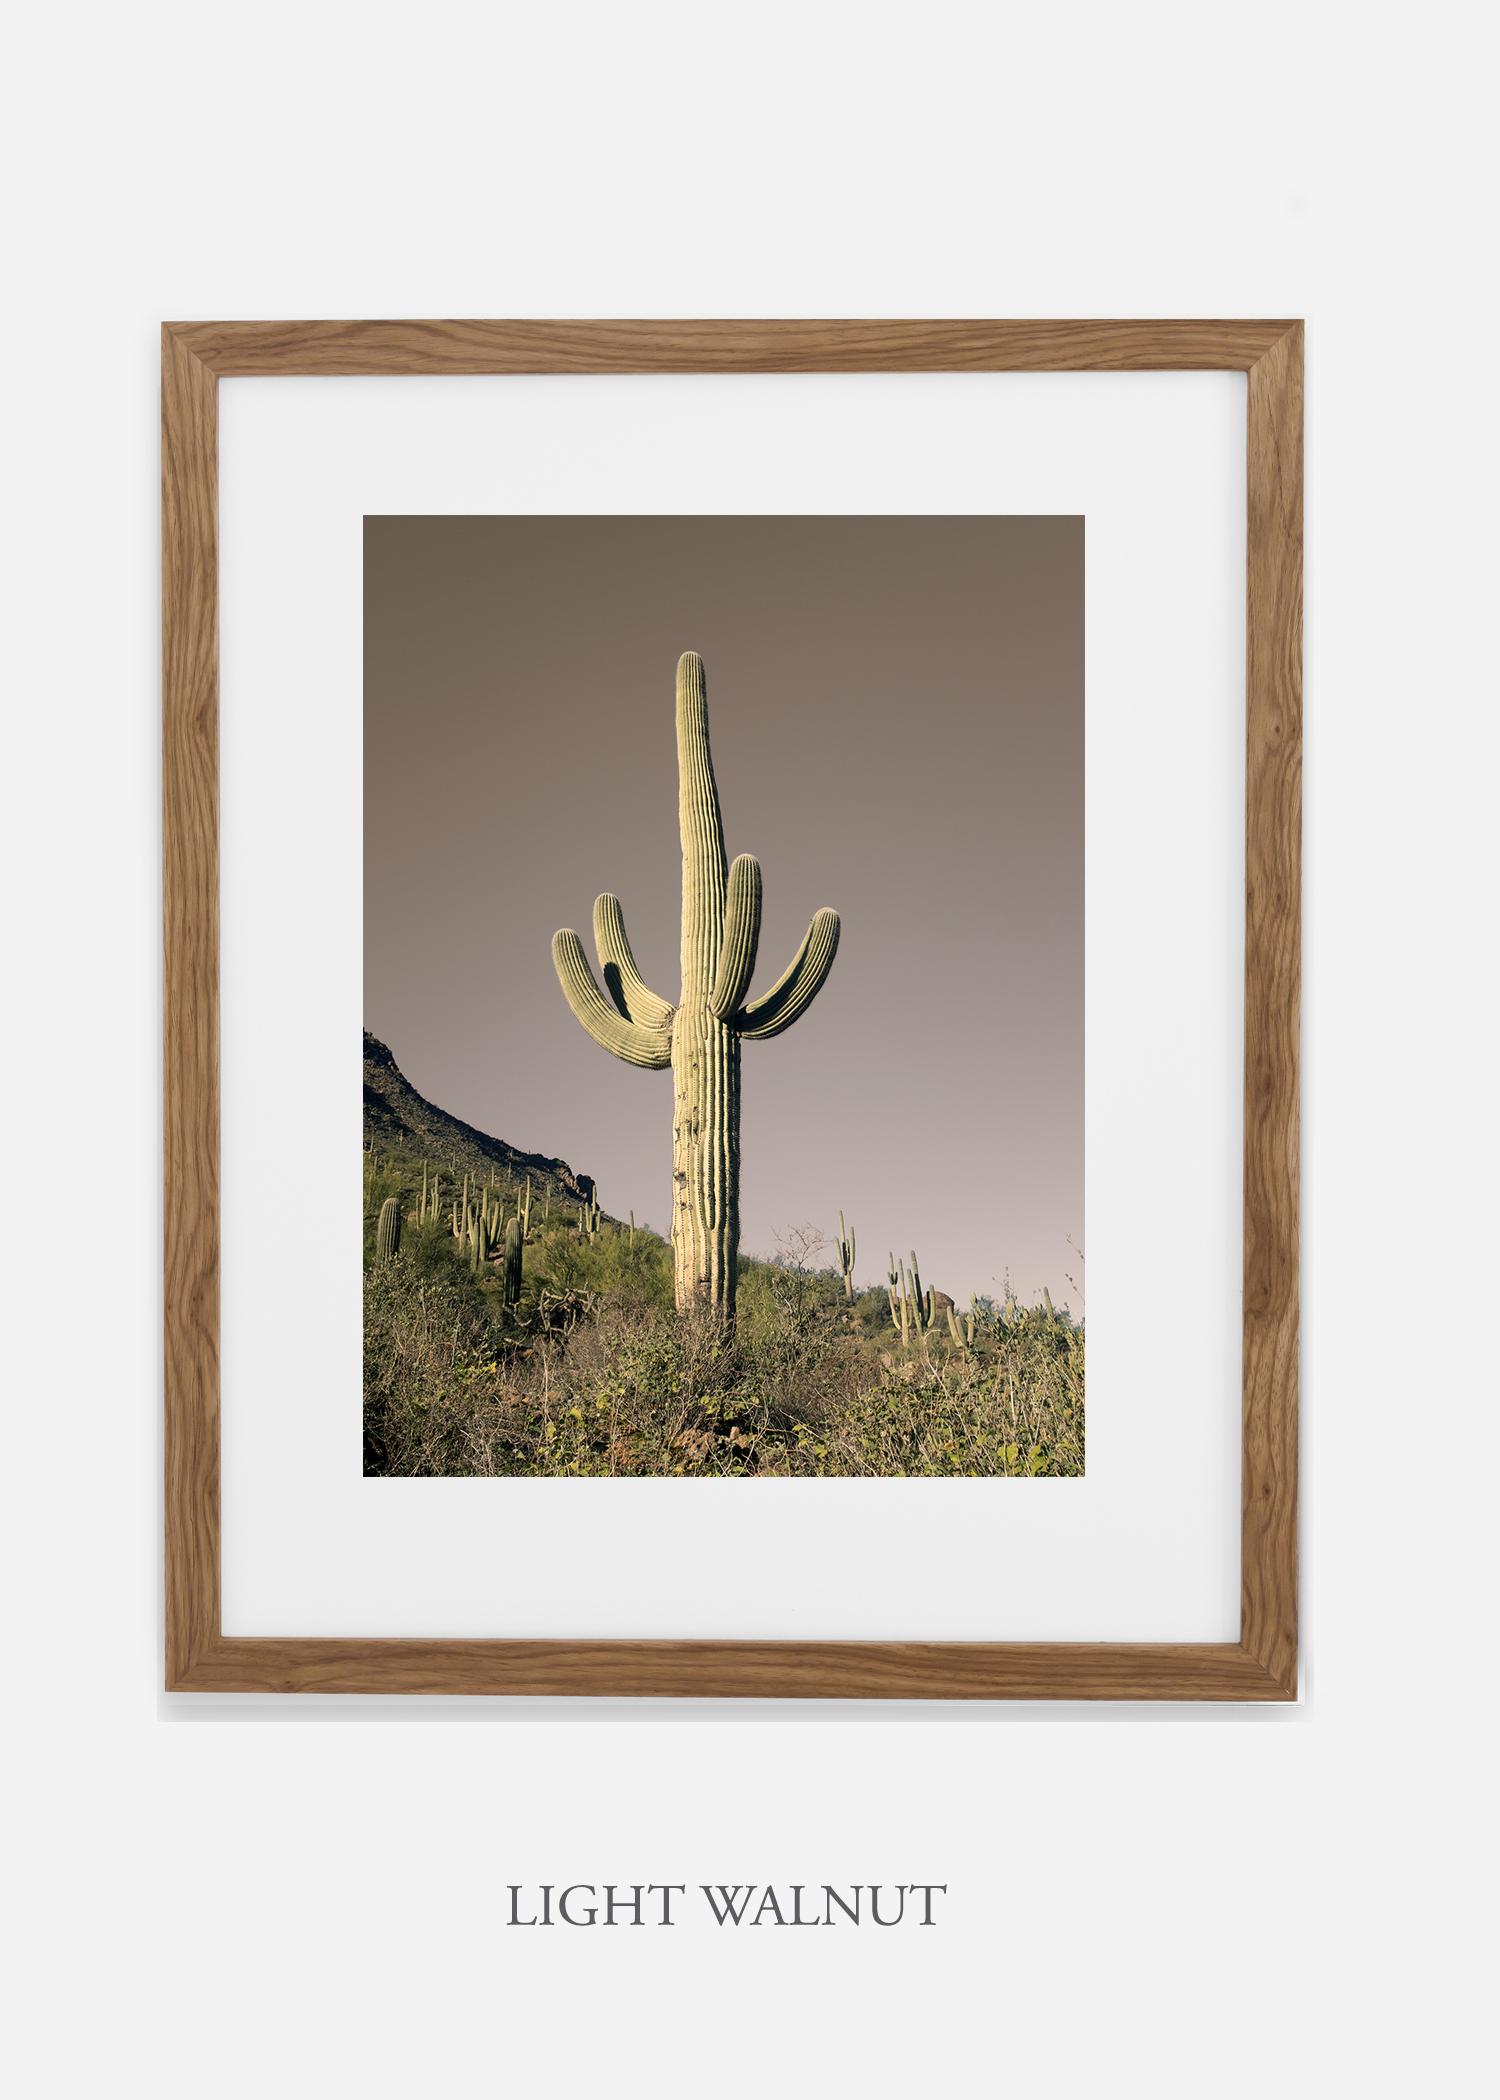 lightwalnutframe-saguaroNo.20-wildercalifornia-art-wallart-cactusprint-homedecor-prints-arizona-botanical-artwork-interiordesign.jpg